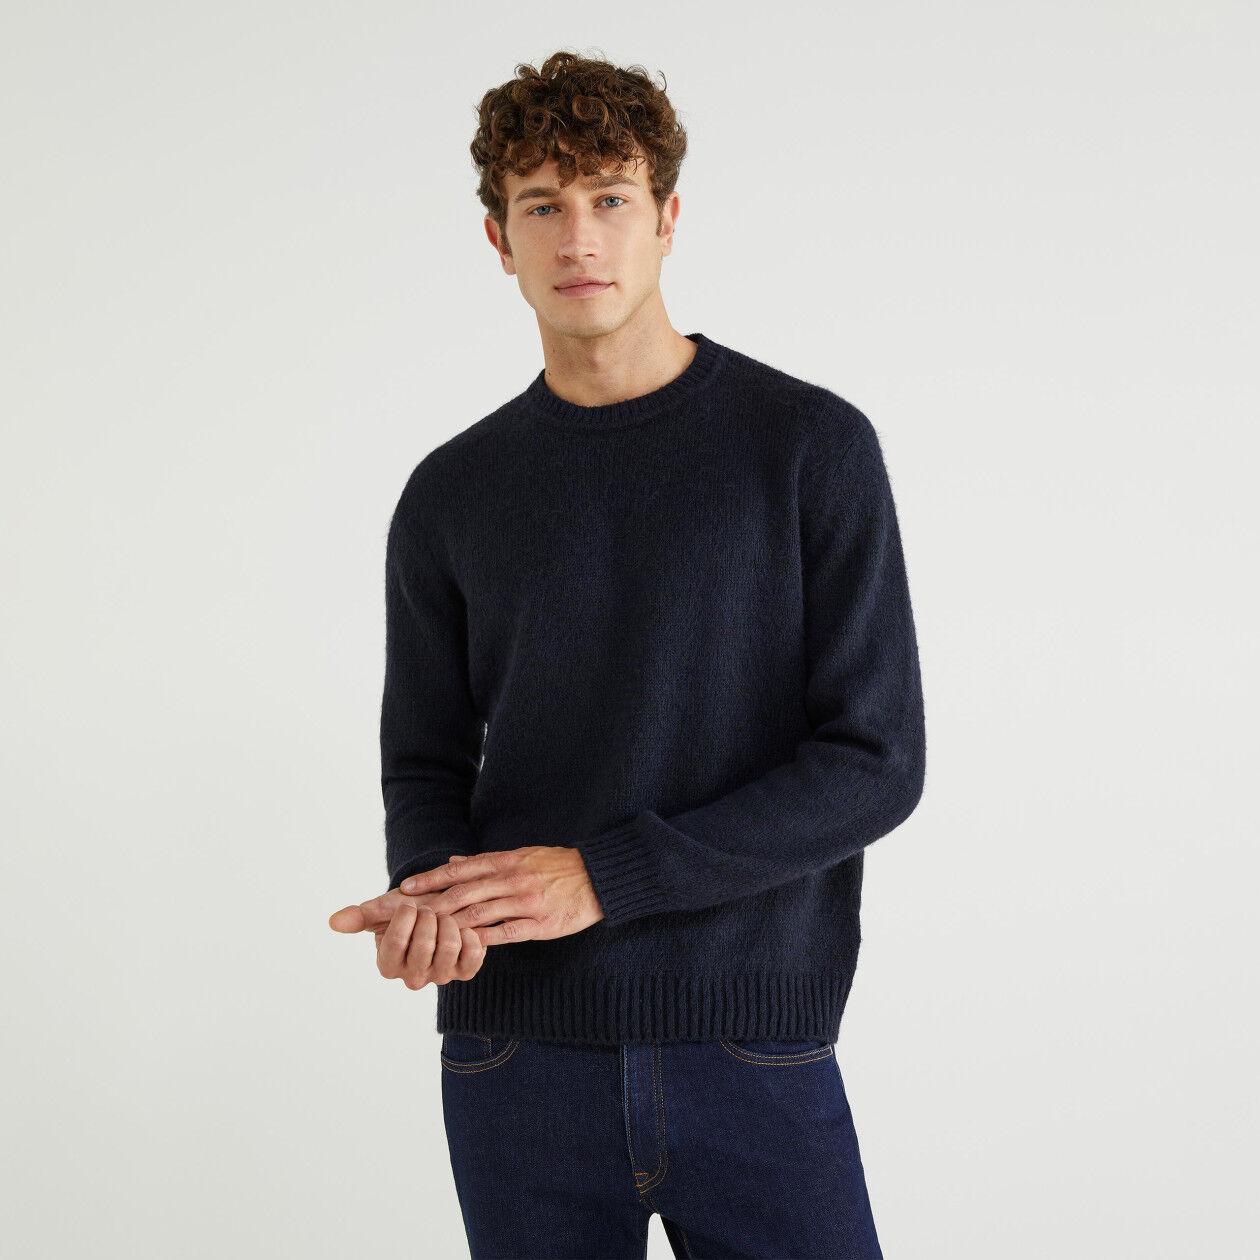 Maglia girocollo misto lana